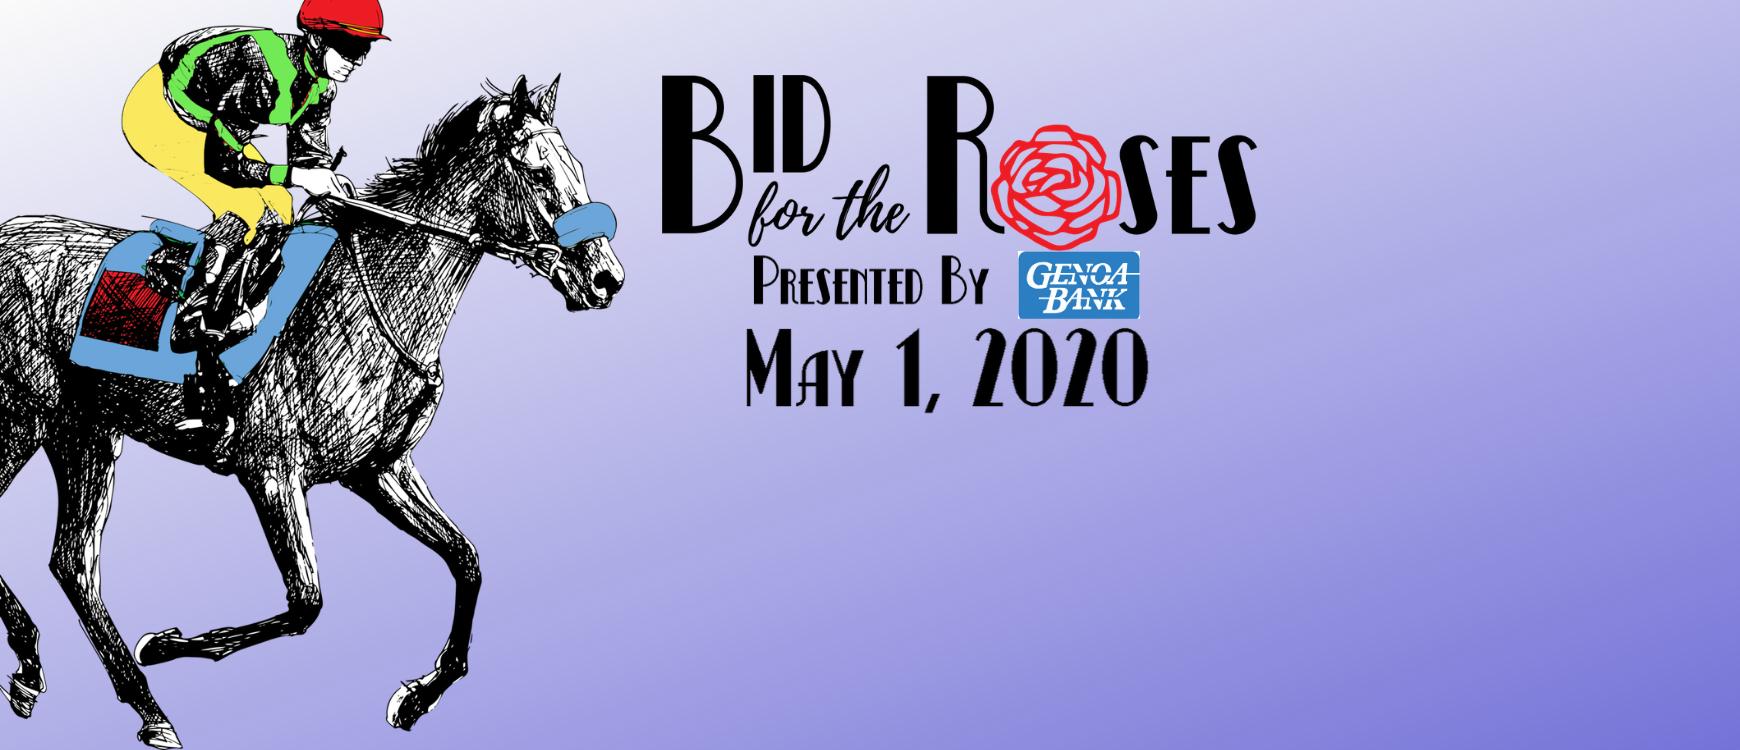 Bid for the Roses